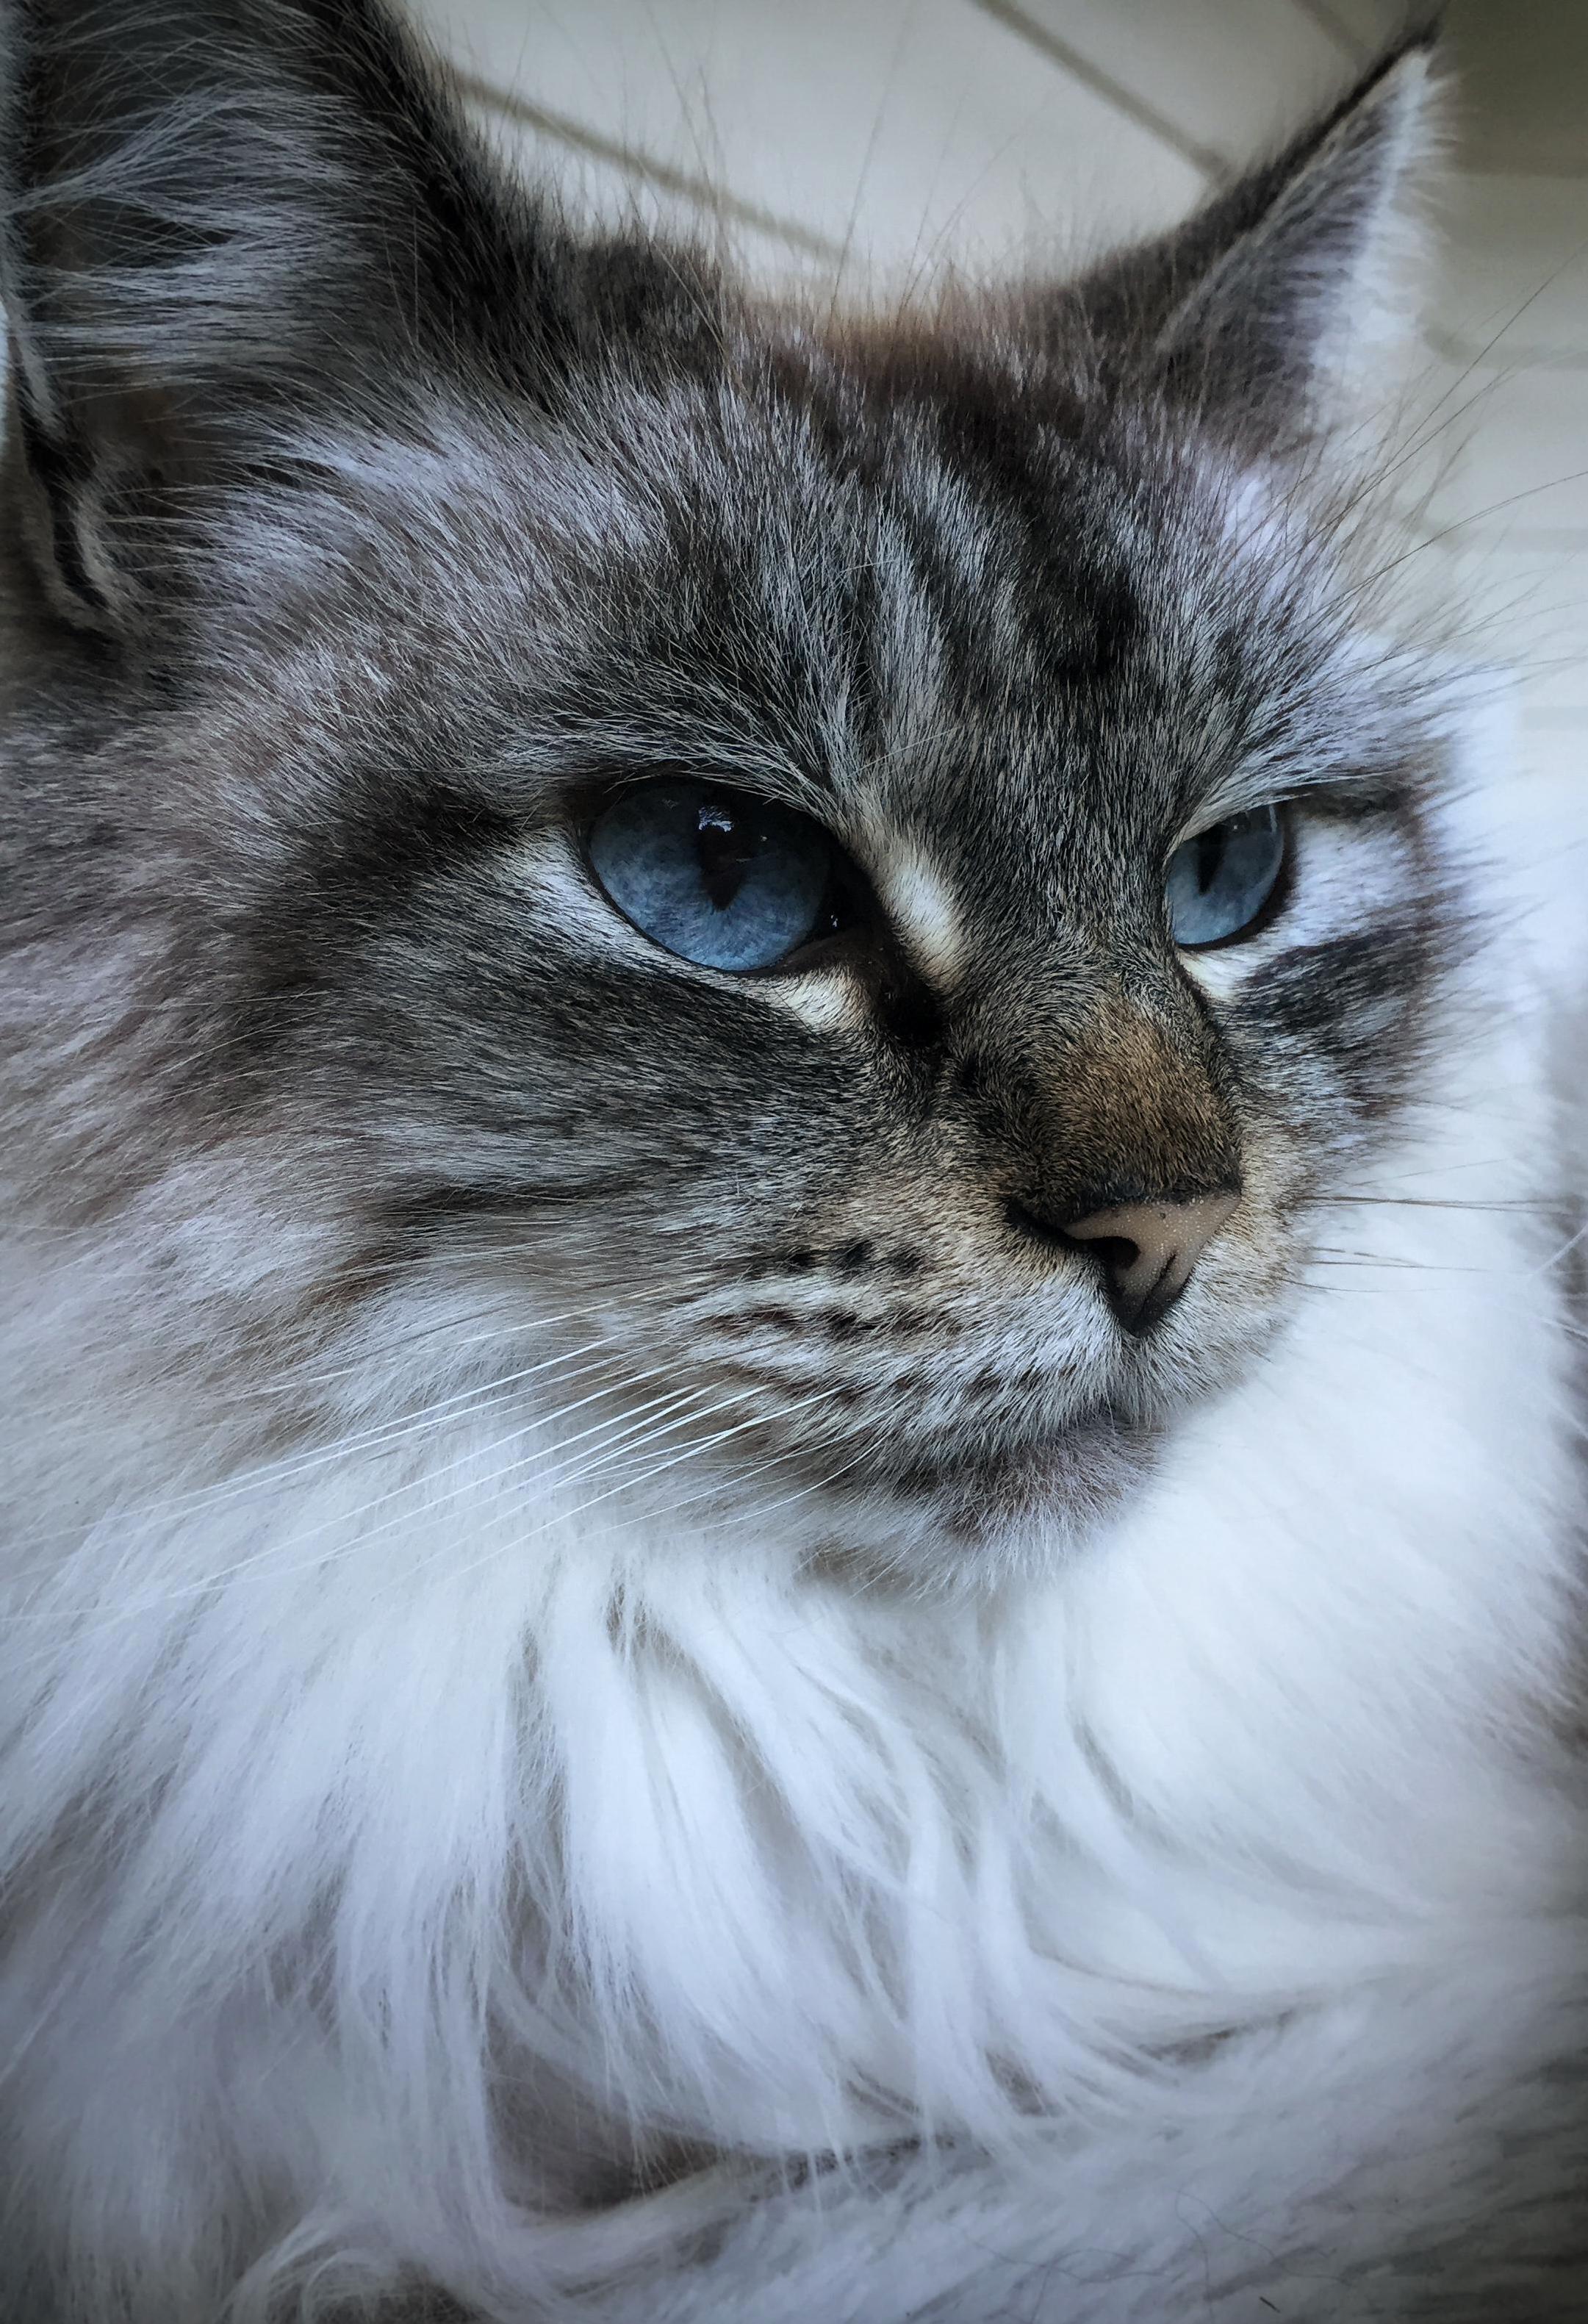 My grandmas cat lily is really photogenic.